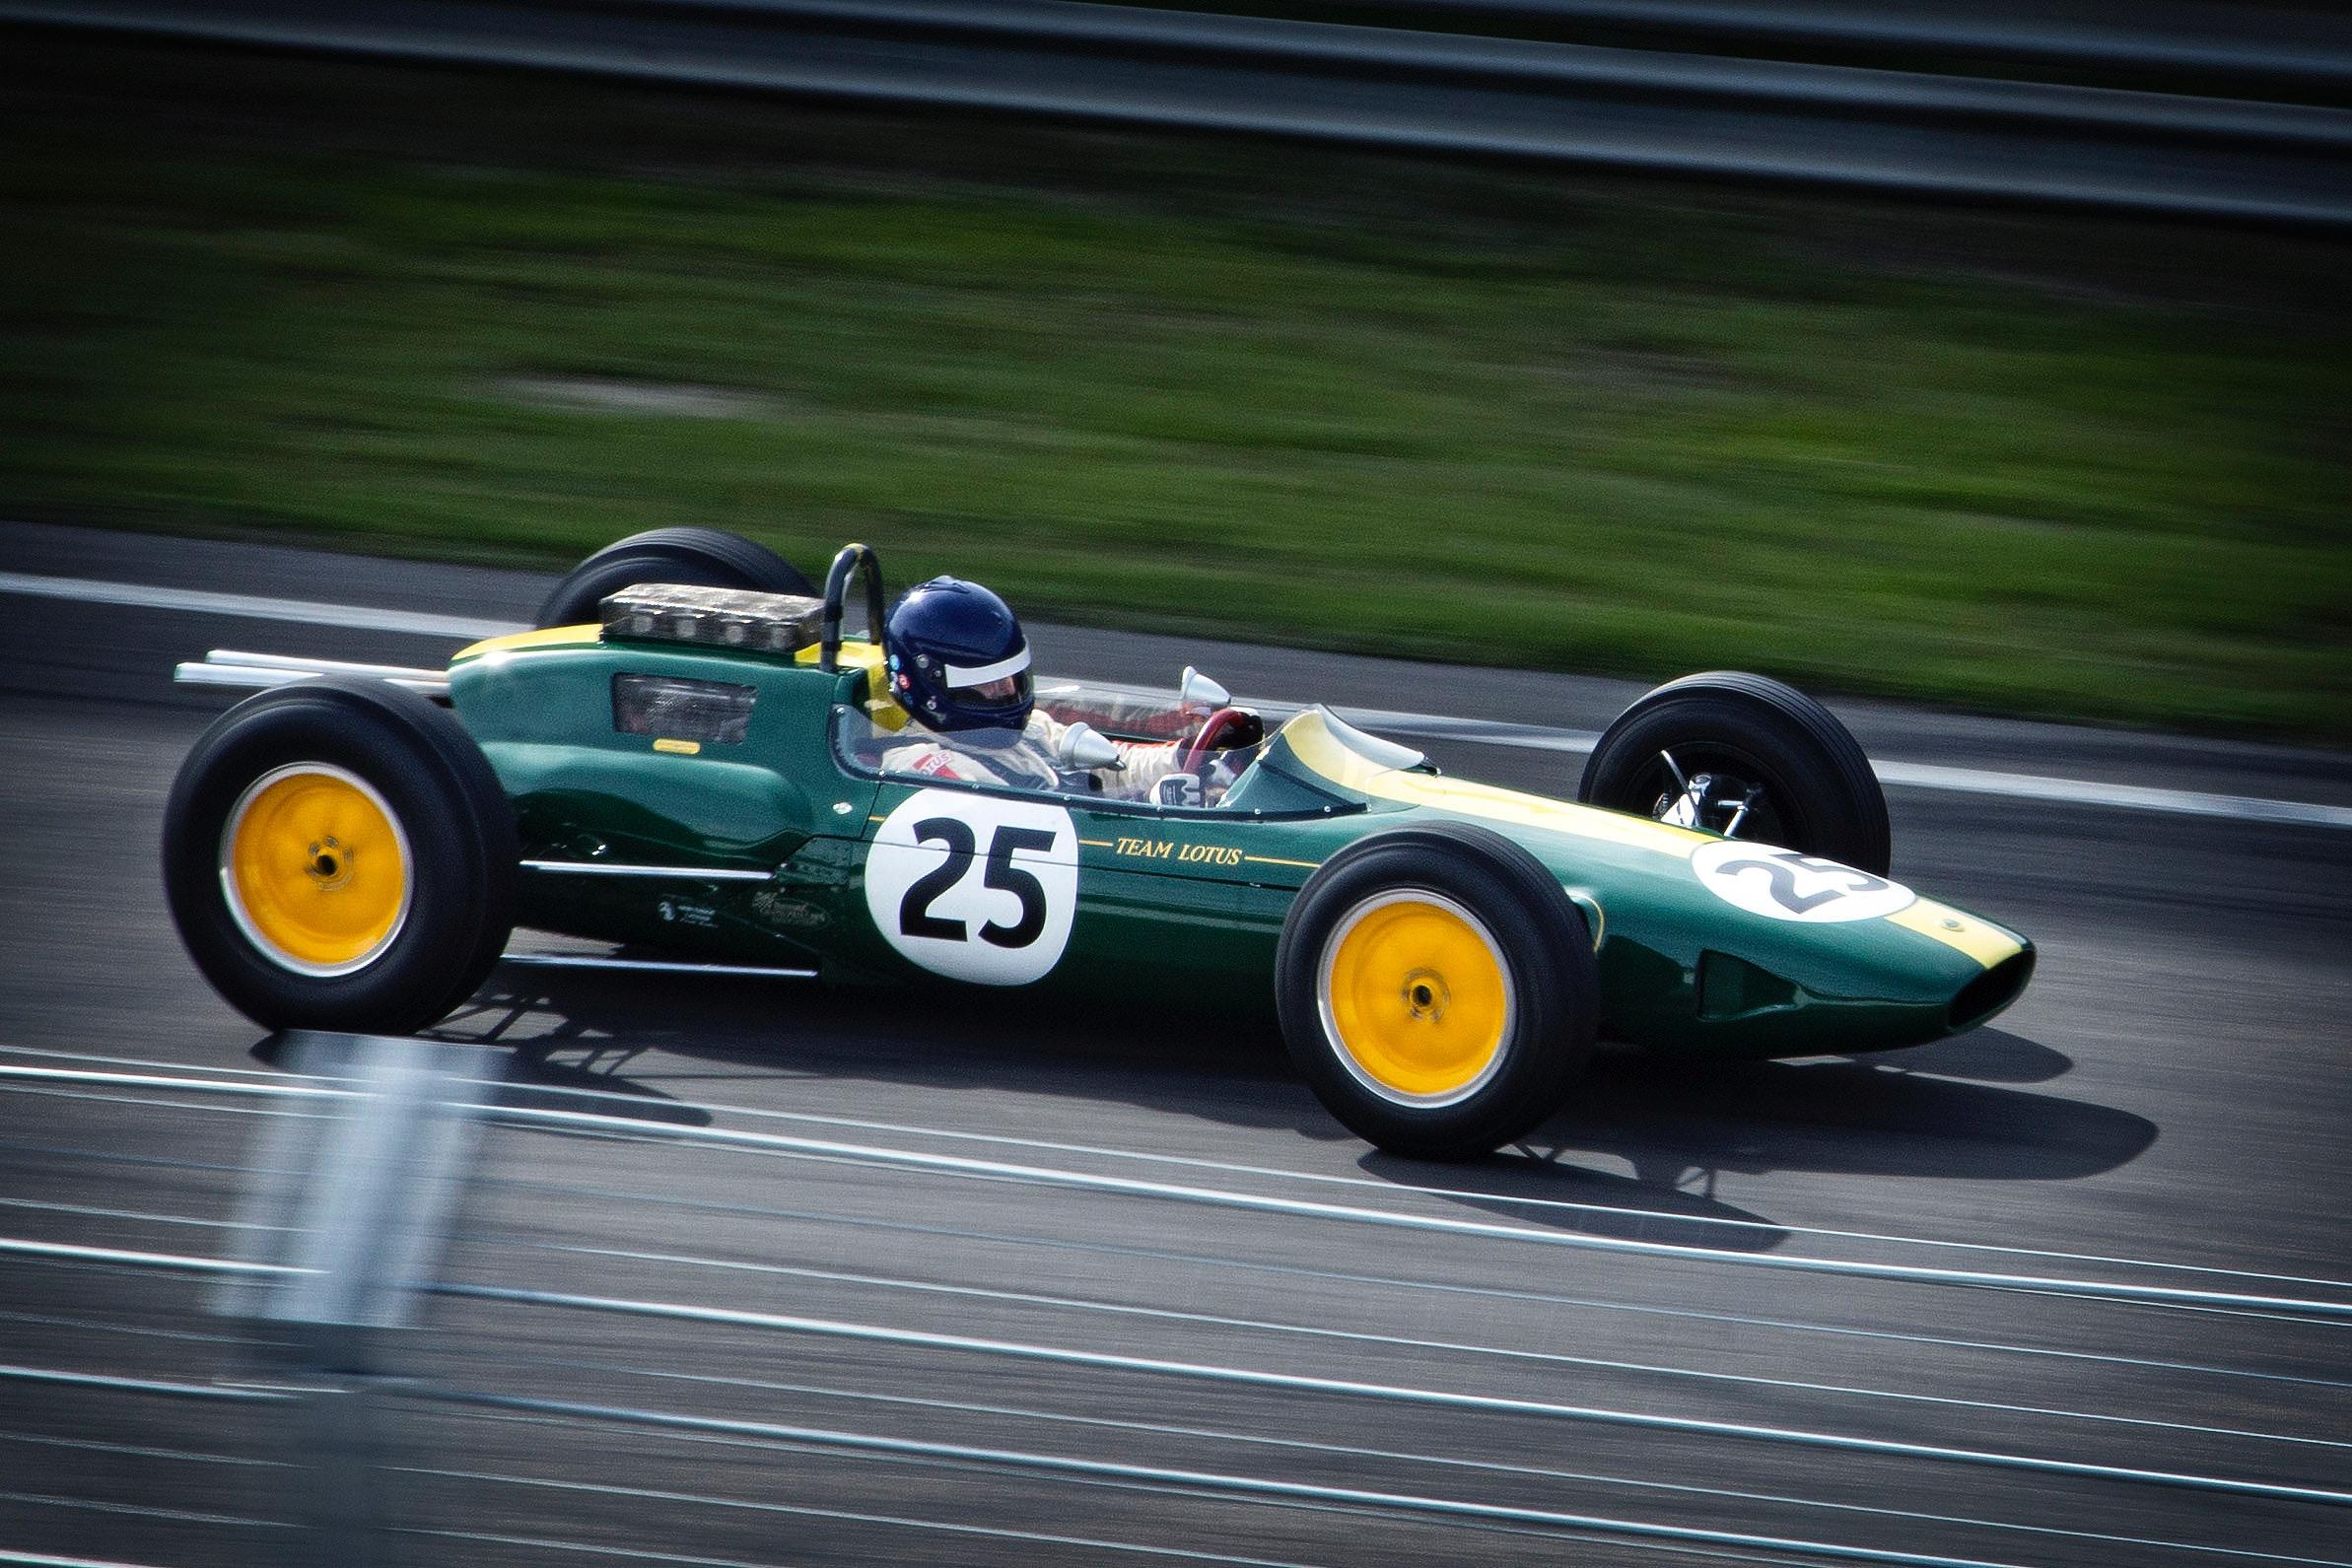 Formel 1-bil